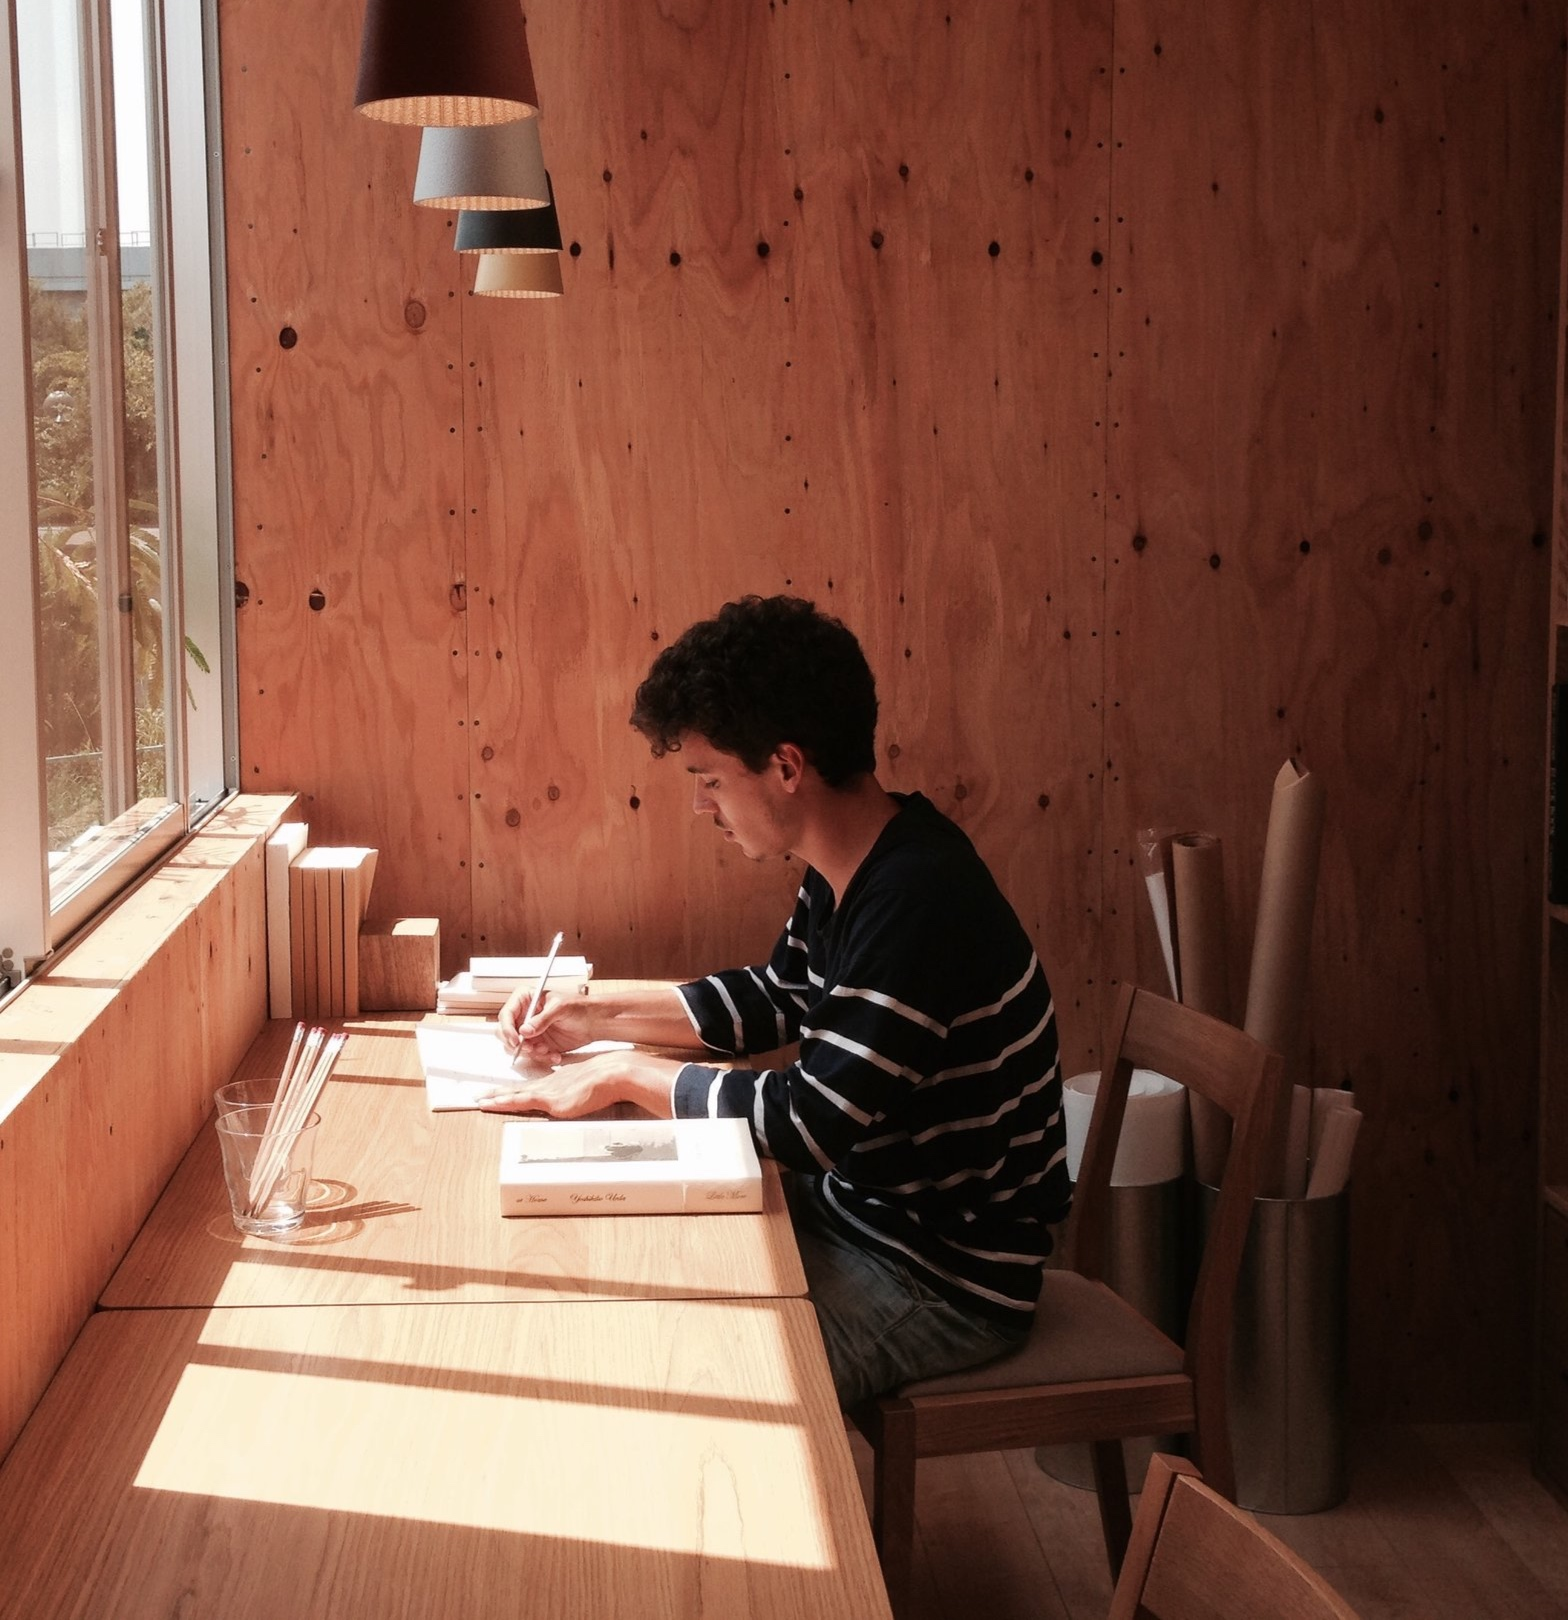 Atelier+Takumi+-+Designer%27s+story+_+Flavien+Delbergue+design+studio.jpg